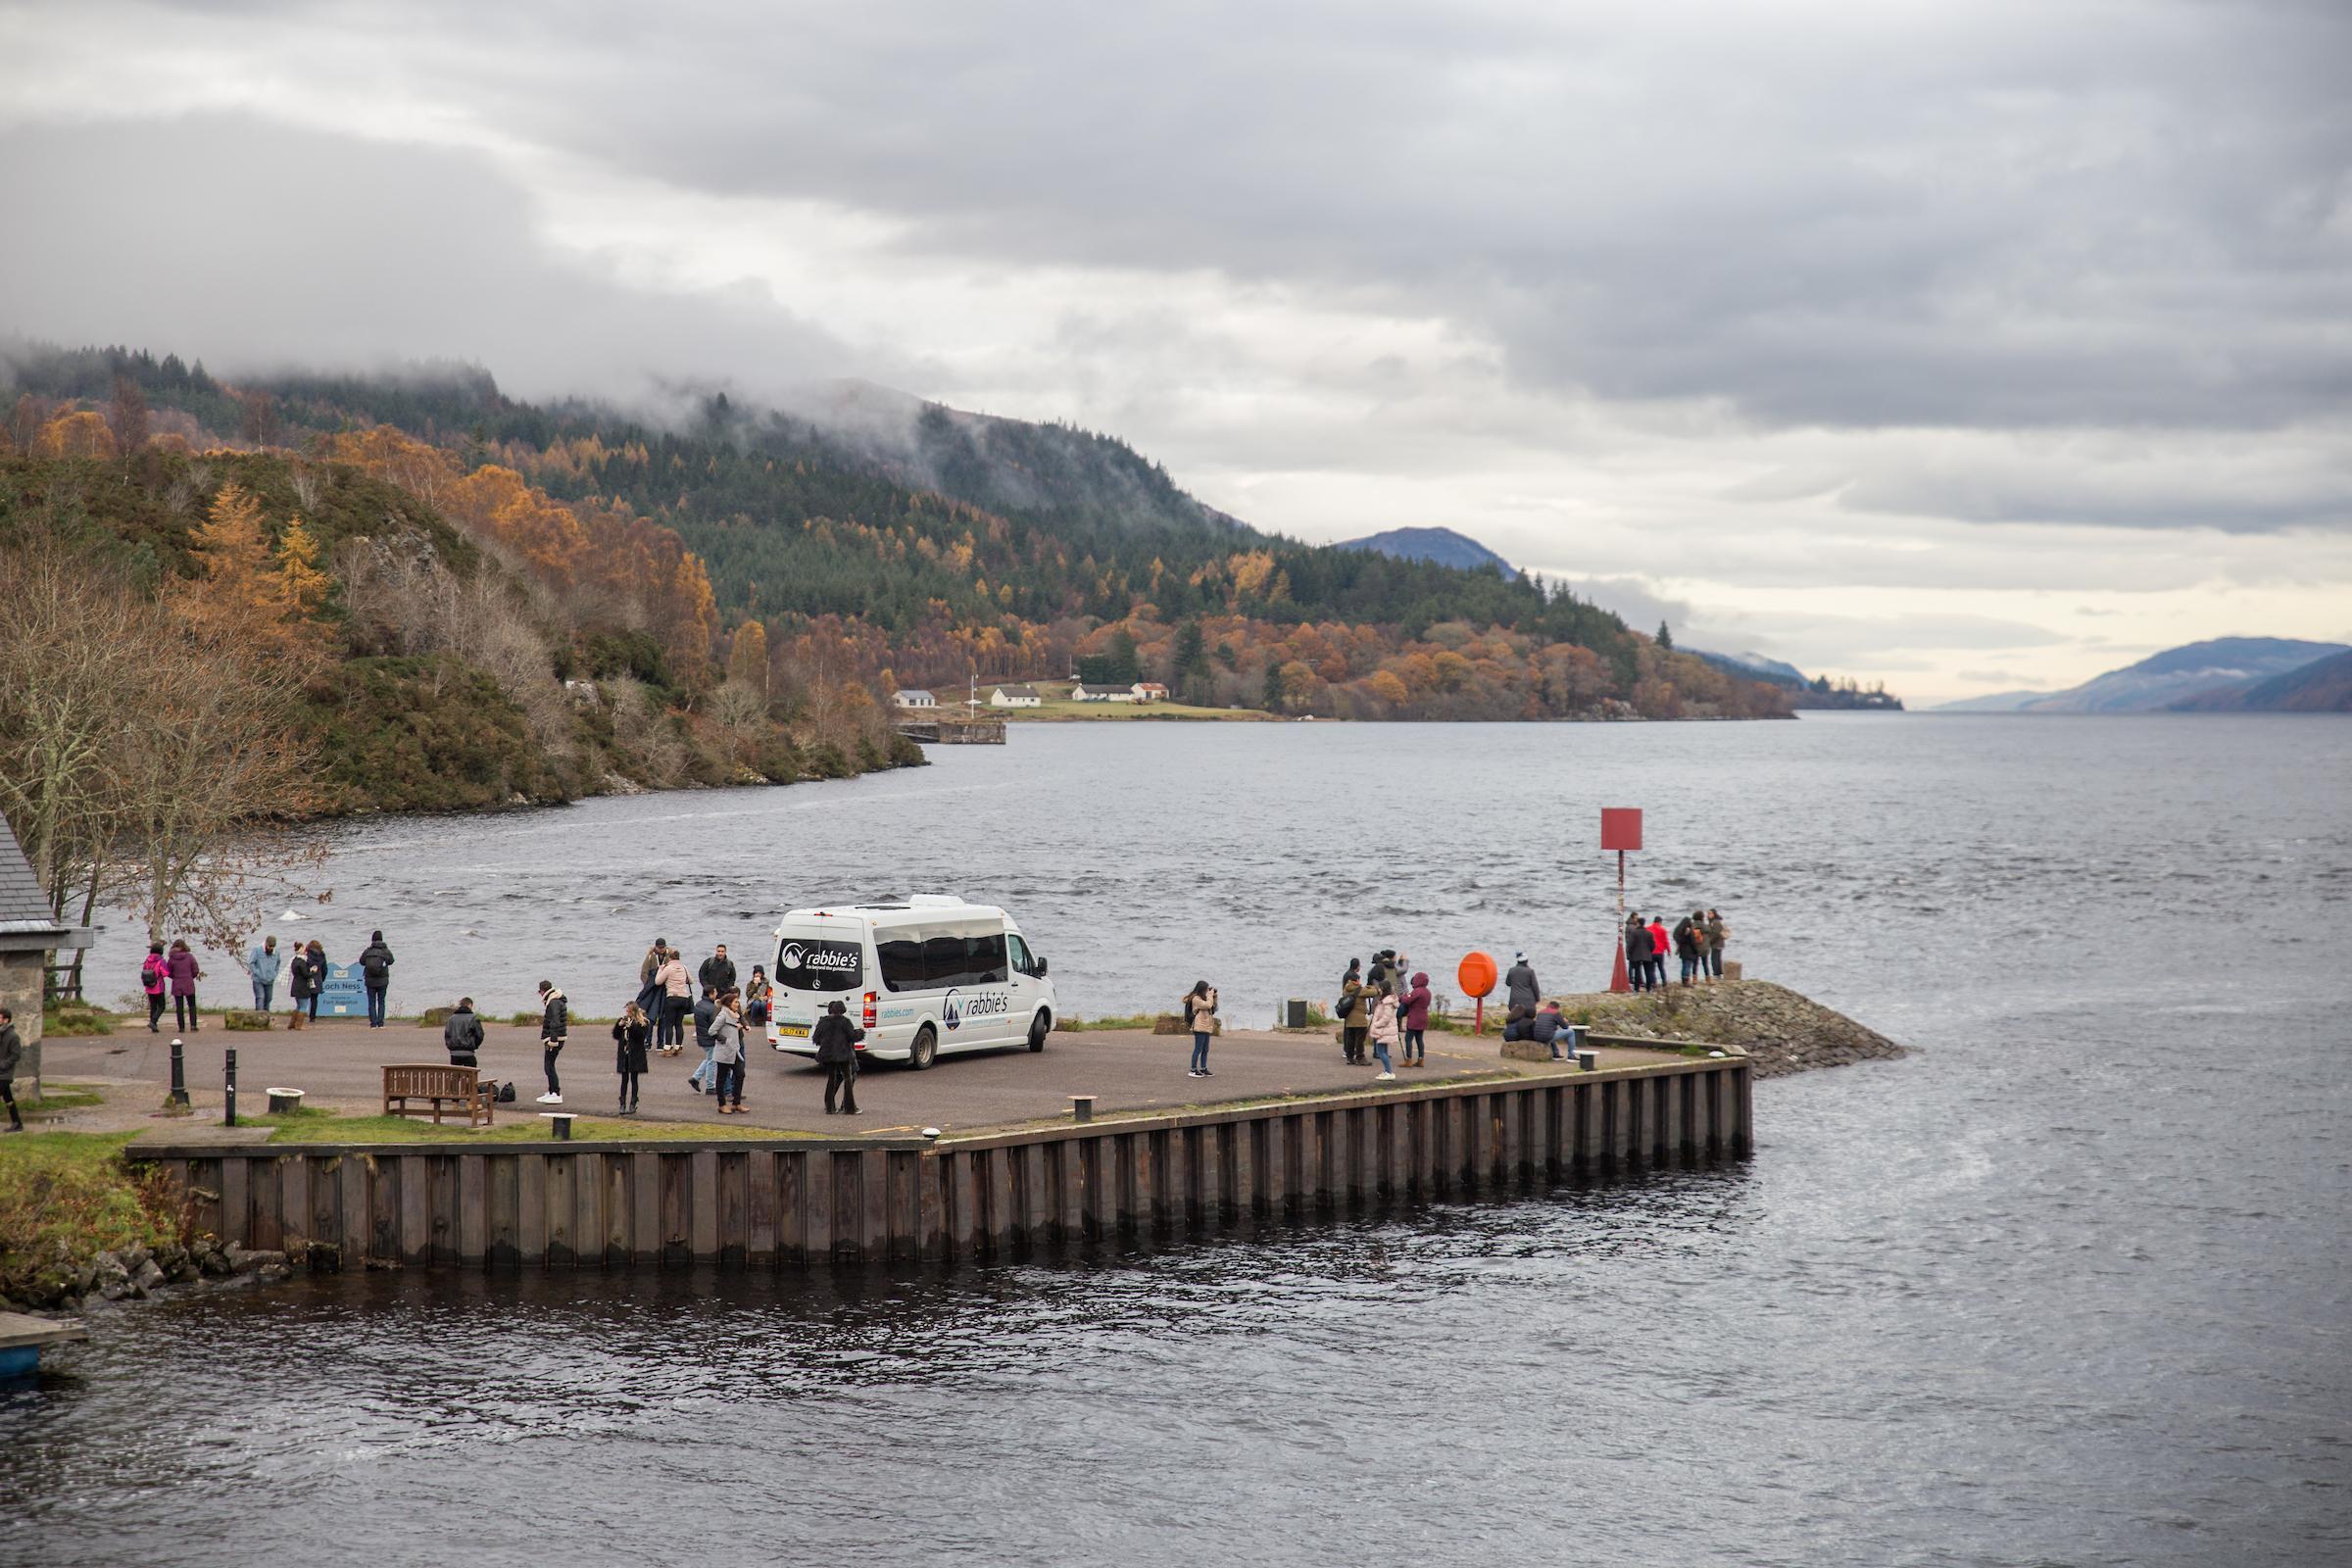 Loch Ness Cruises